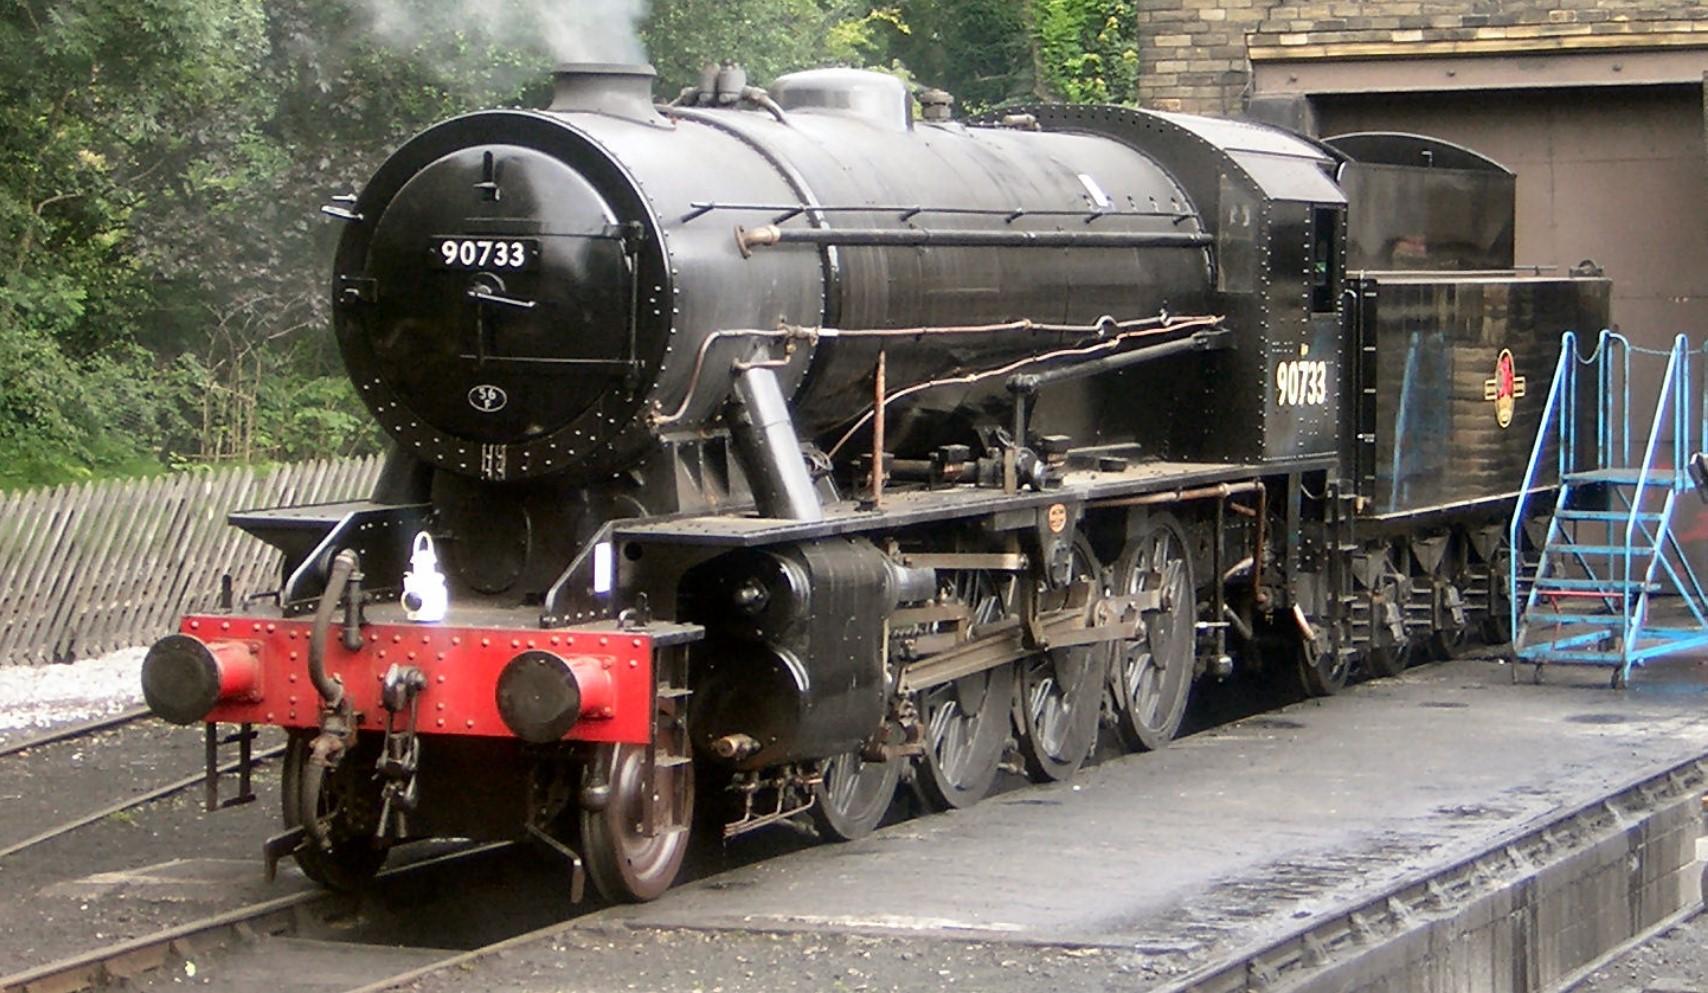 90733 at Haworth in July 2007. ©Public Domain